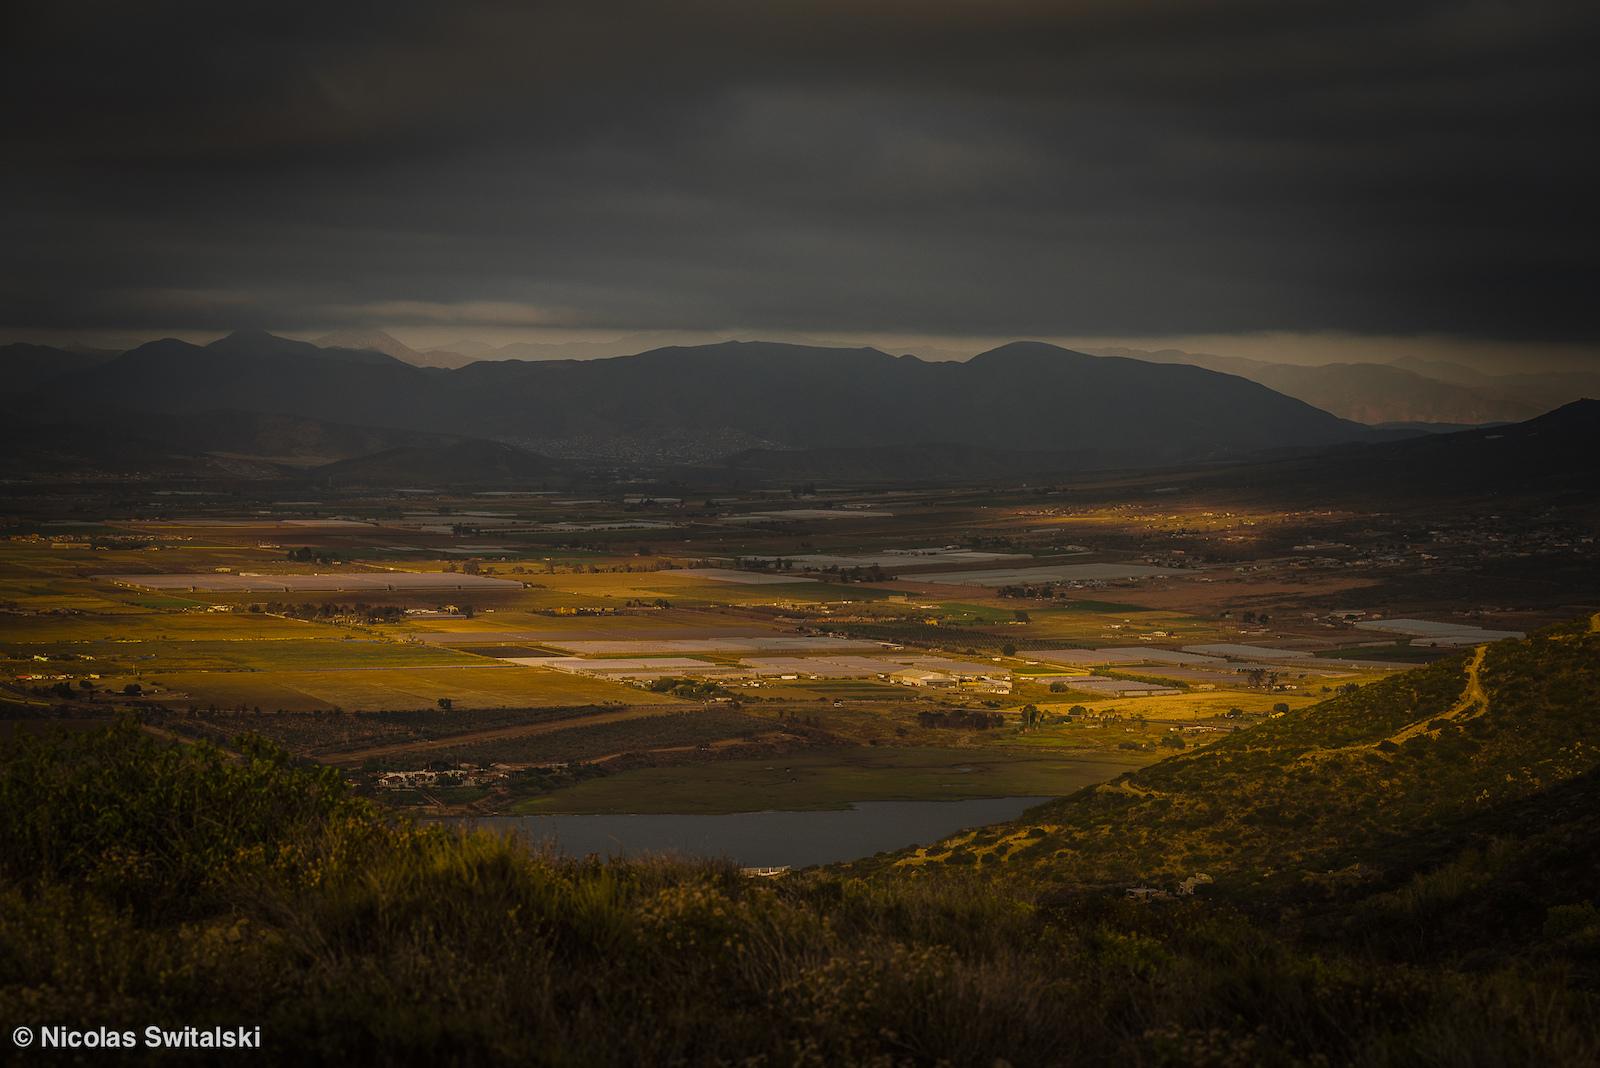 Chillin in Baja s Wine Region Valle de Guadalupe